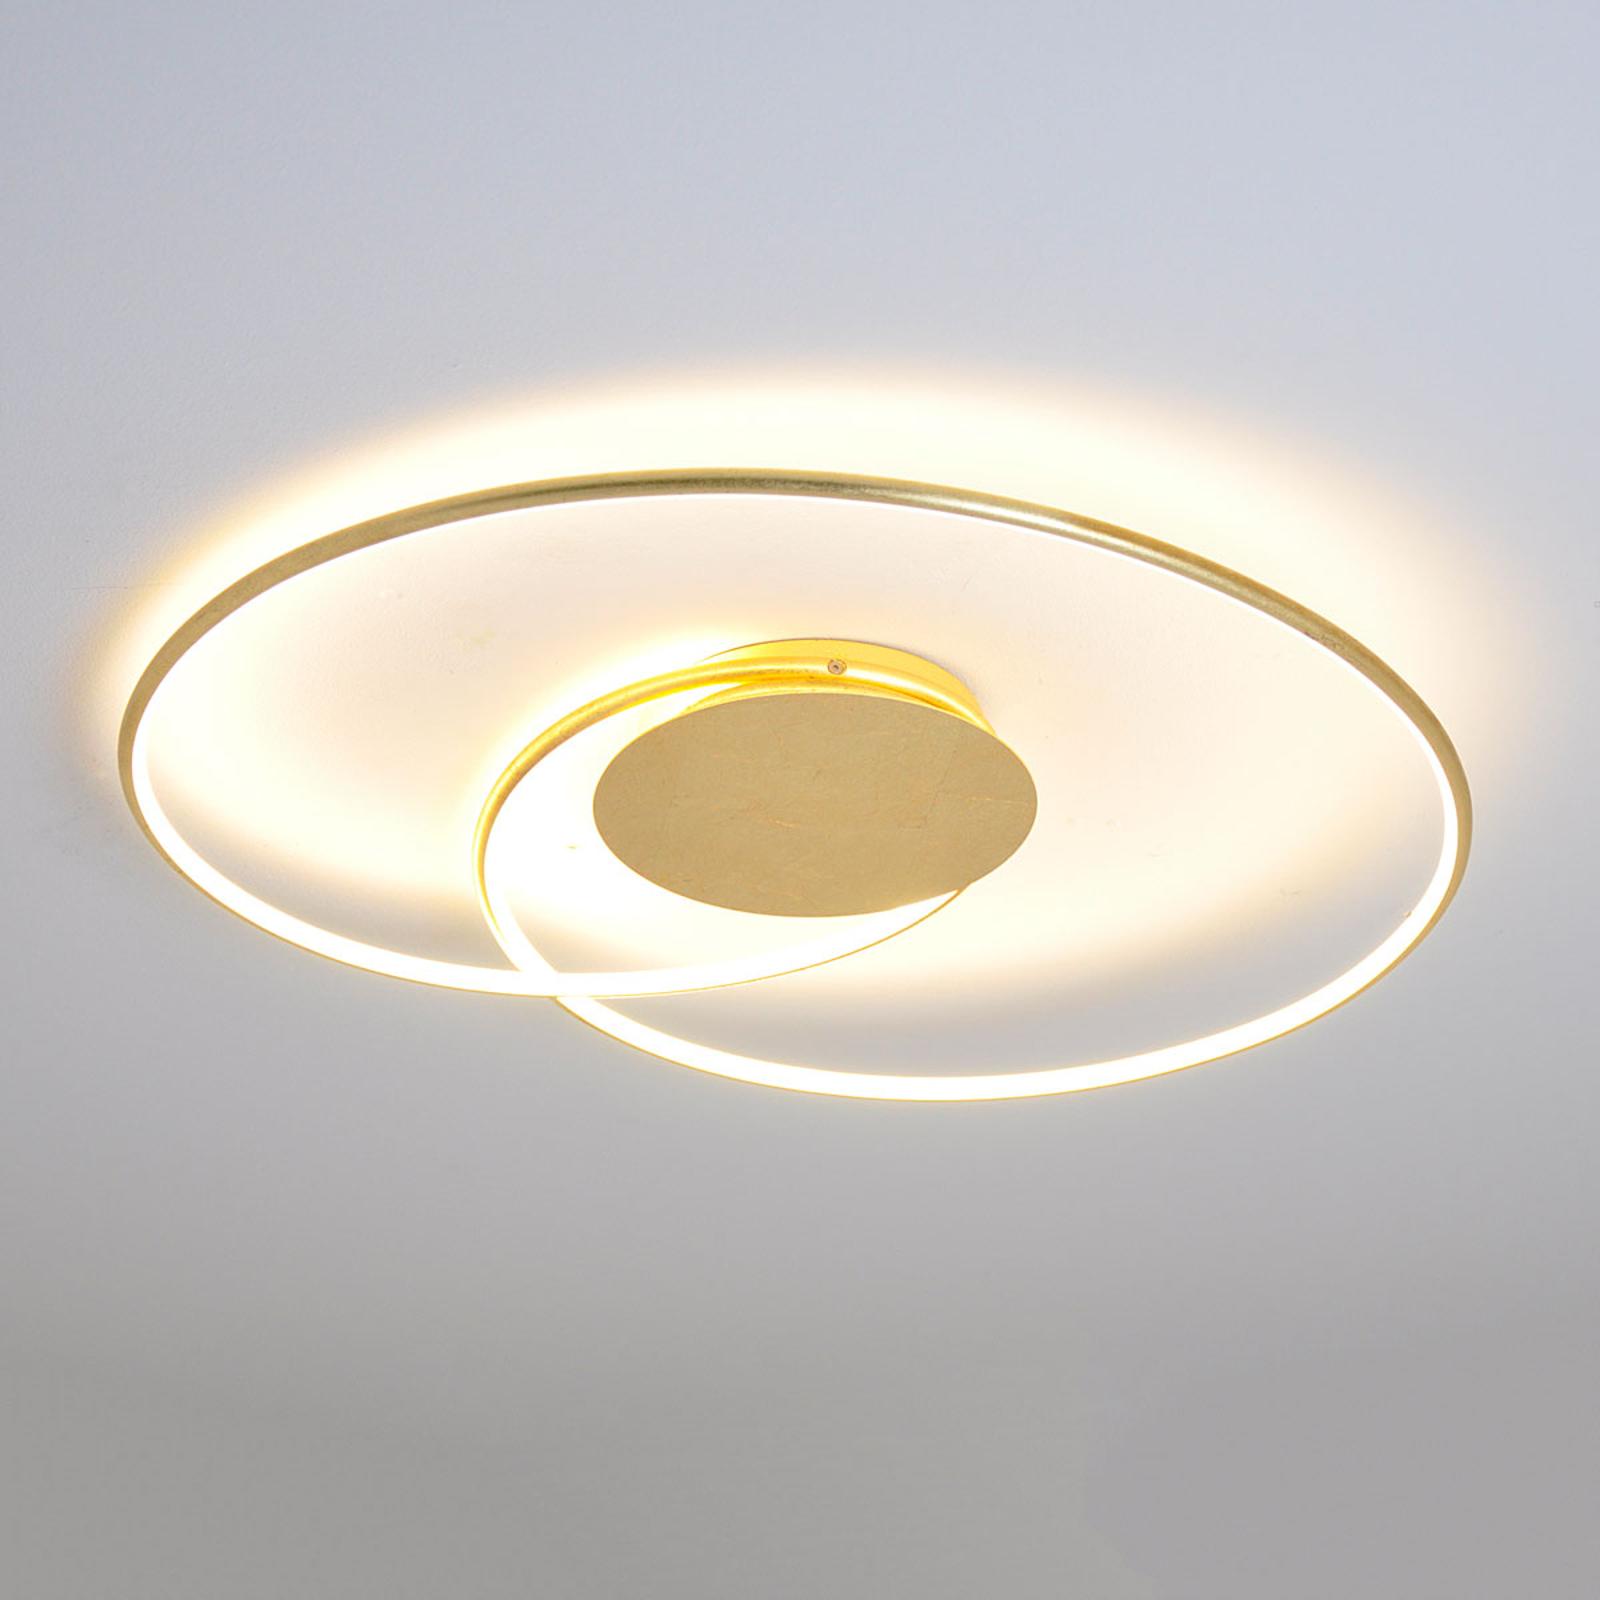 LED-Deckenlampe Joline, gold, 74 cm